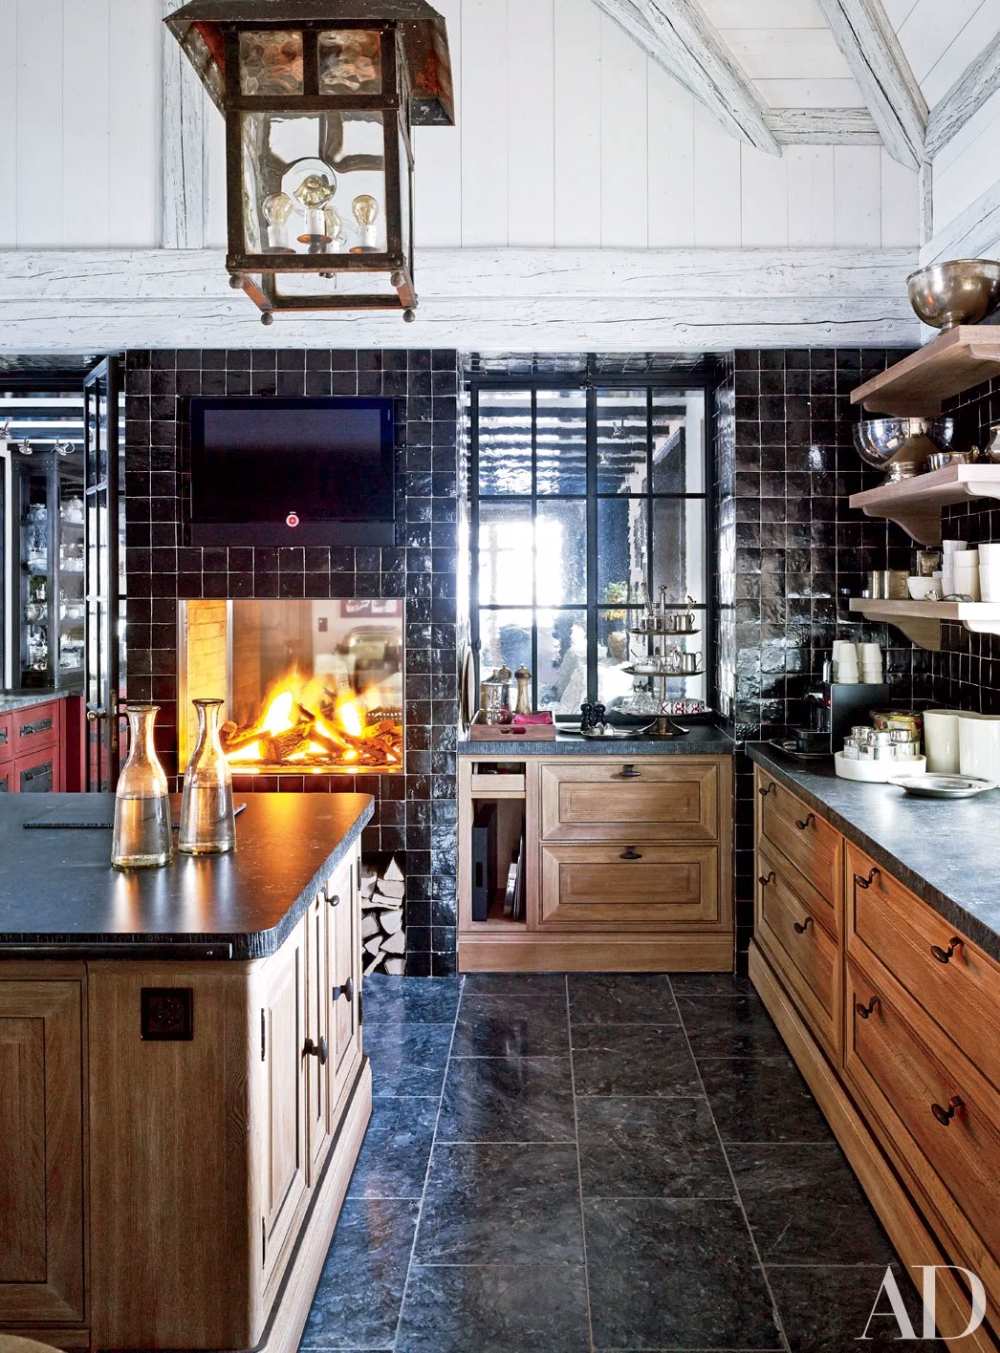 25 black countertops to inspire your kitchen renovation black kitchen countertops kitchen on kitchen decor black countertop id=94196